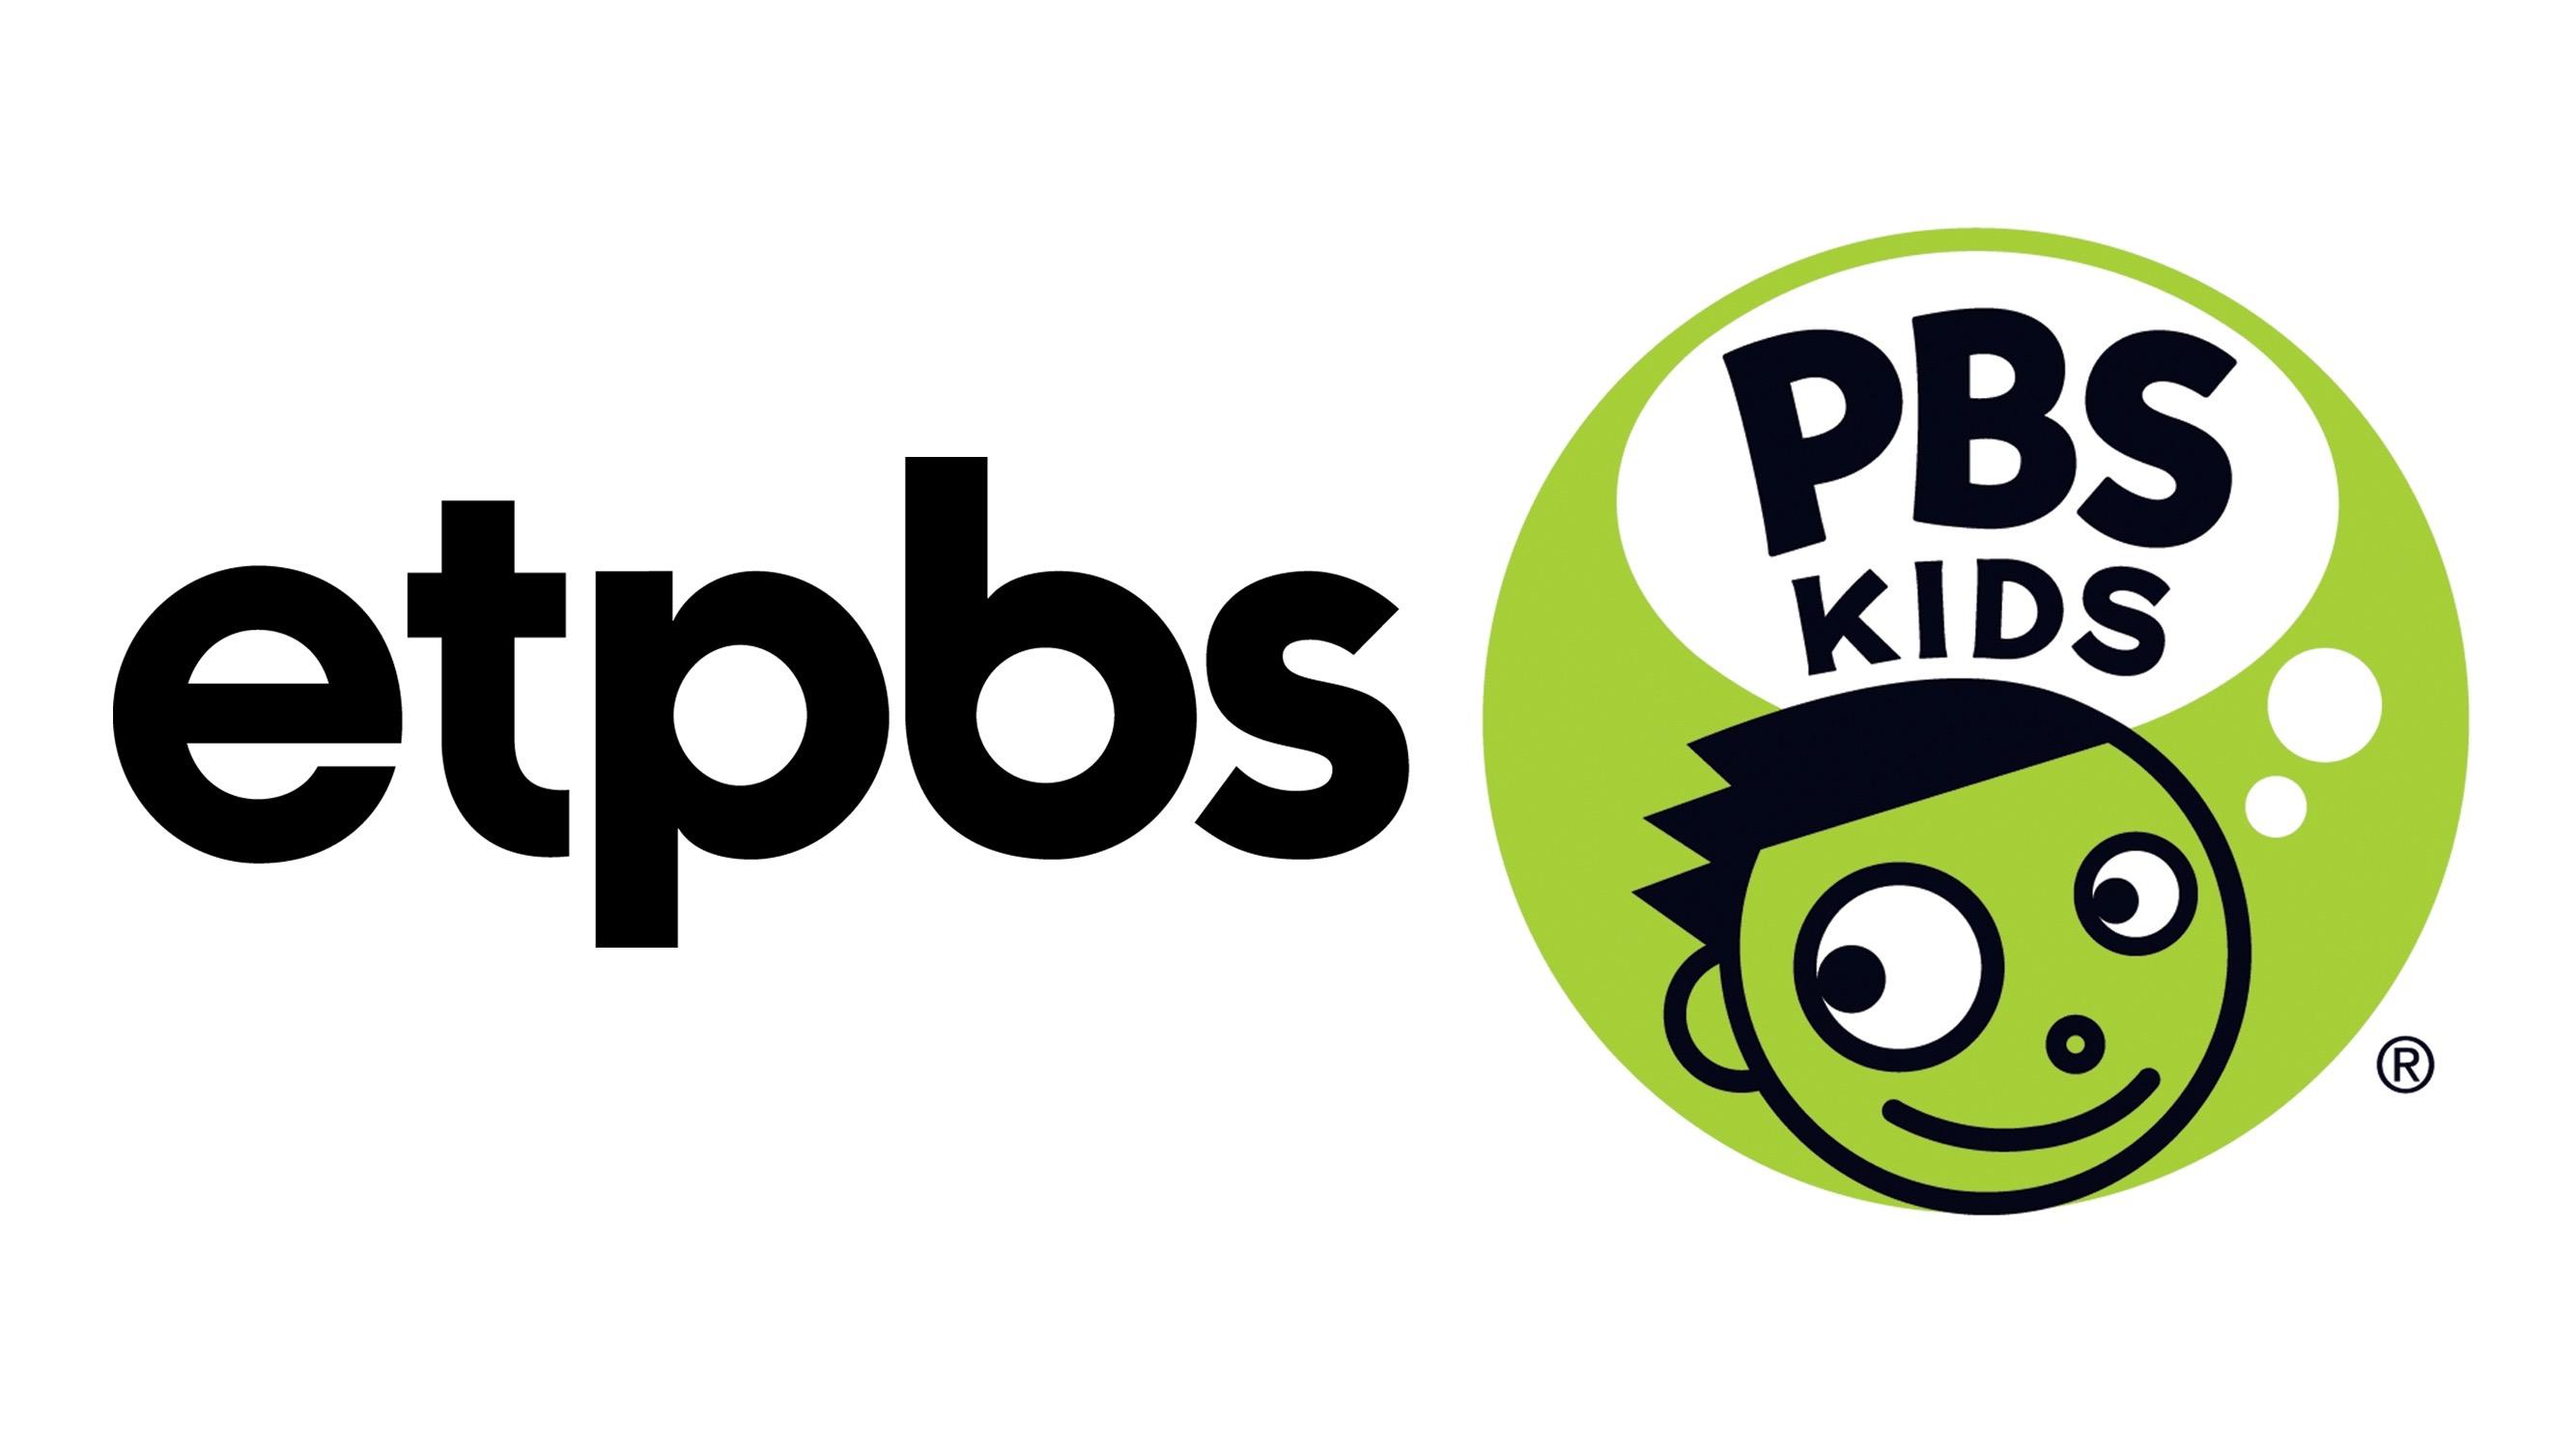 etpbs_kids_alpha_RGB (1).jpg